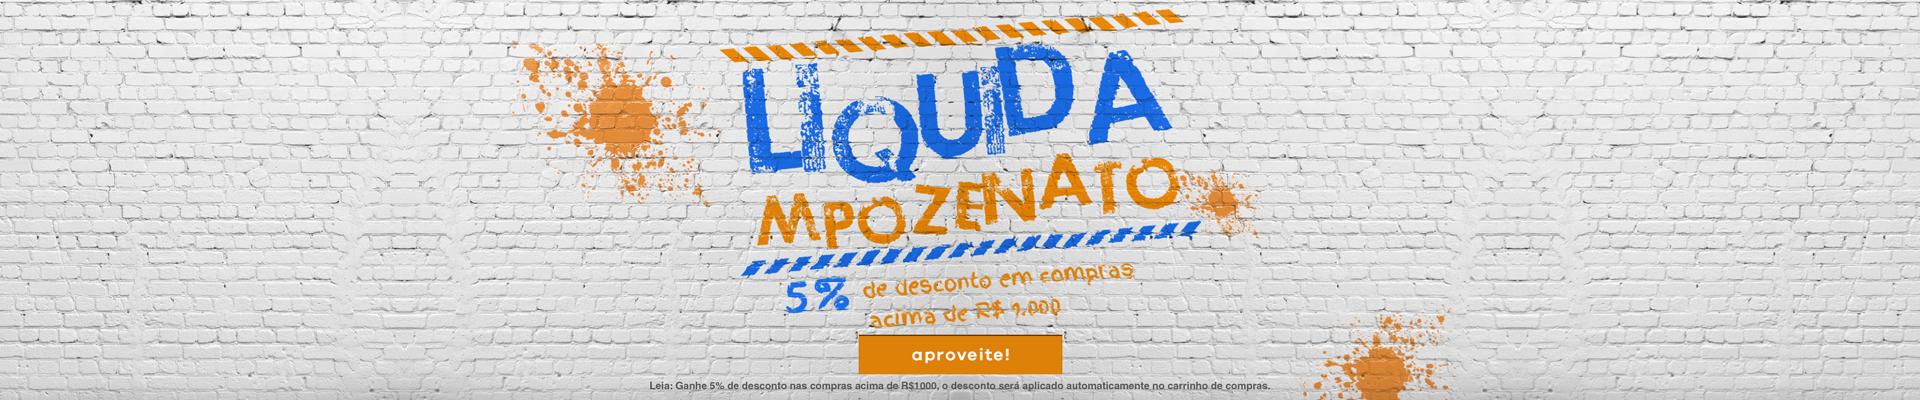 Liquida Tudo - Mpozenato Móveis